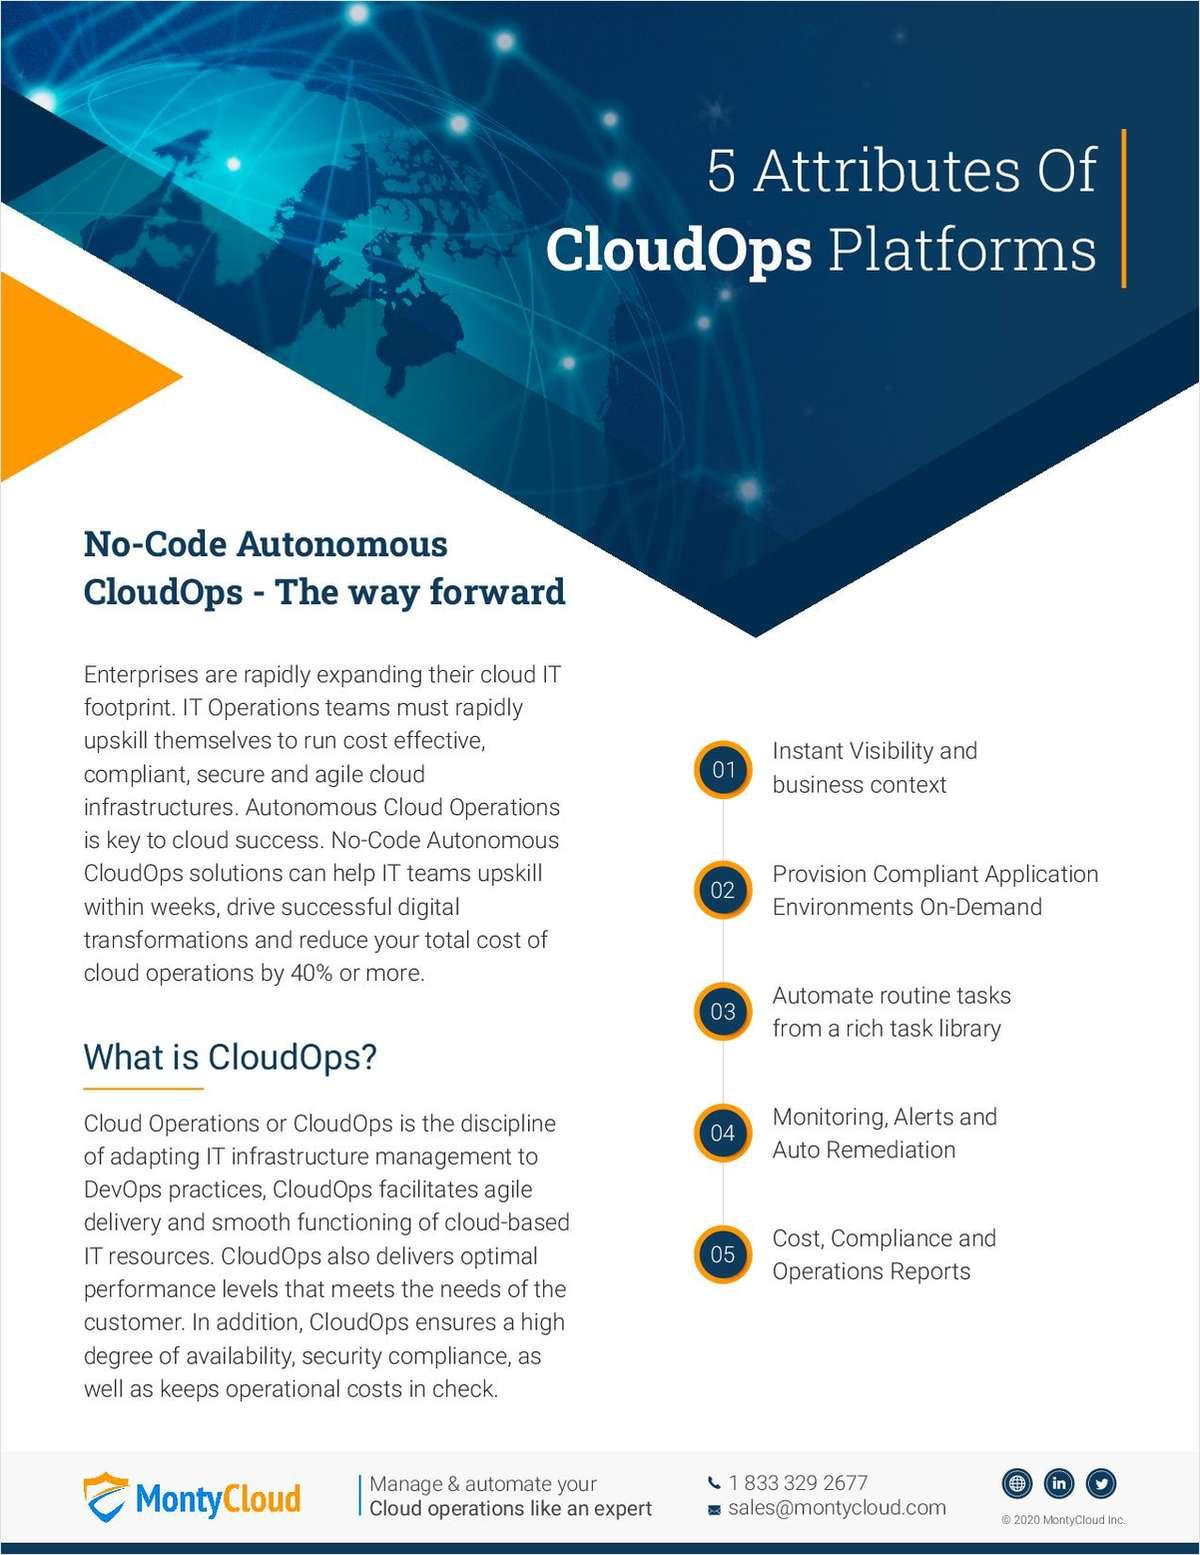 5 Attributes Of CloudOps Platforms